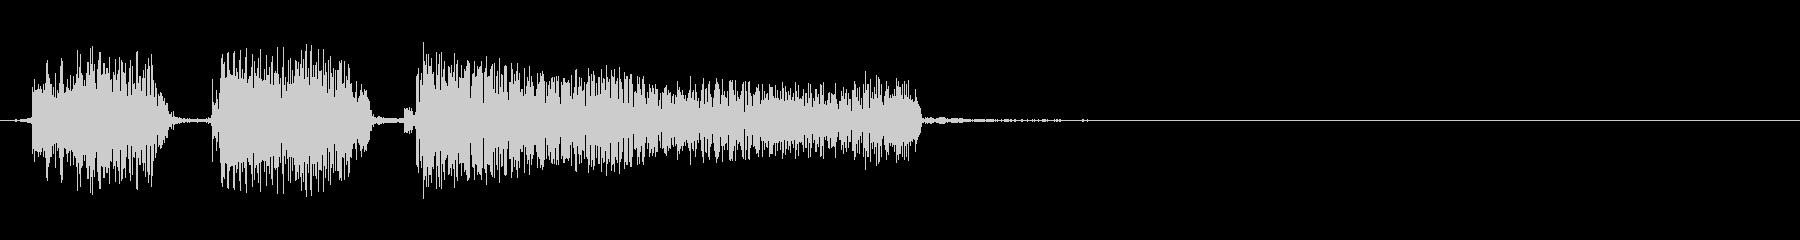 STEEL GUITAR:I DO...の未再生の波形